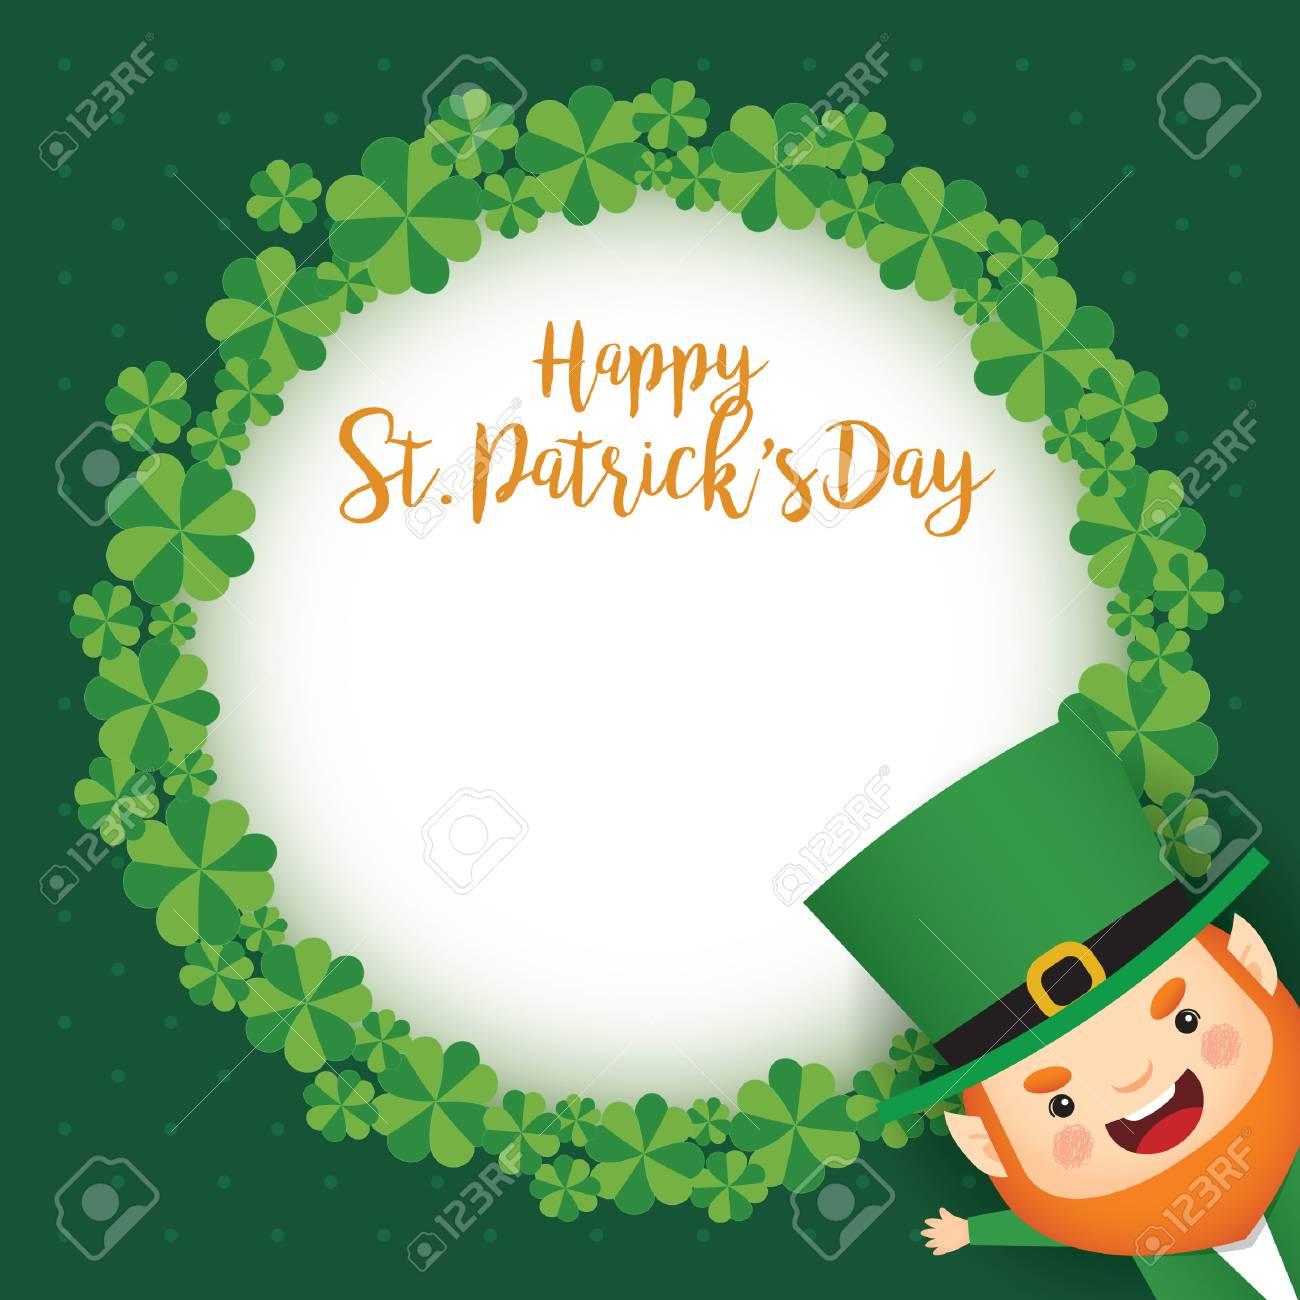 Happy St Patricks Day Greeting Card Template Cute Leprechaun